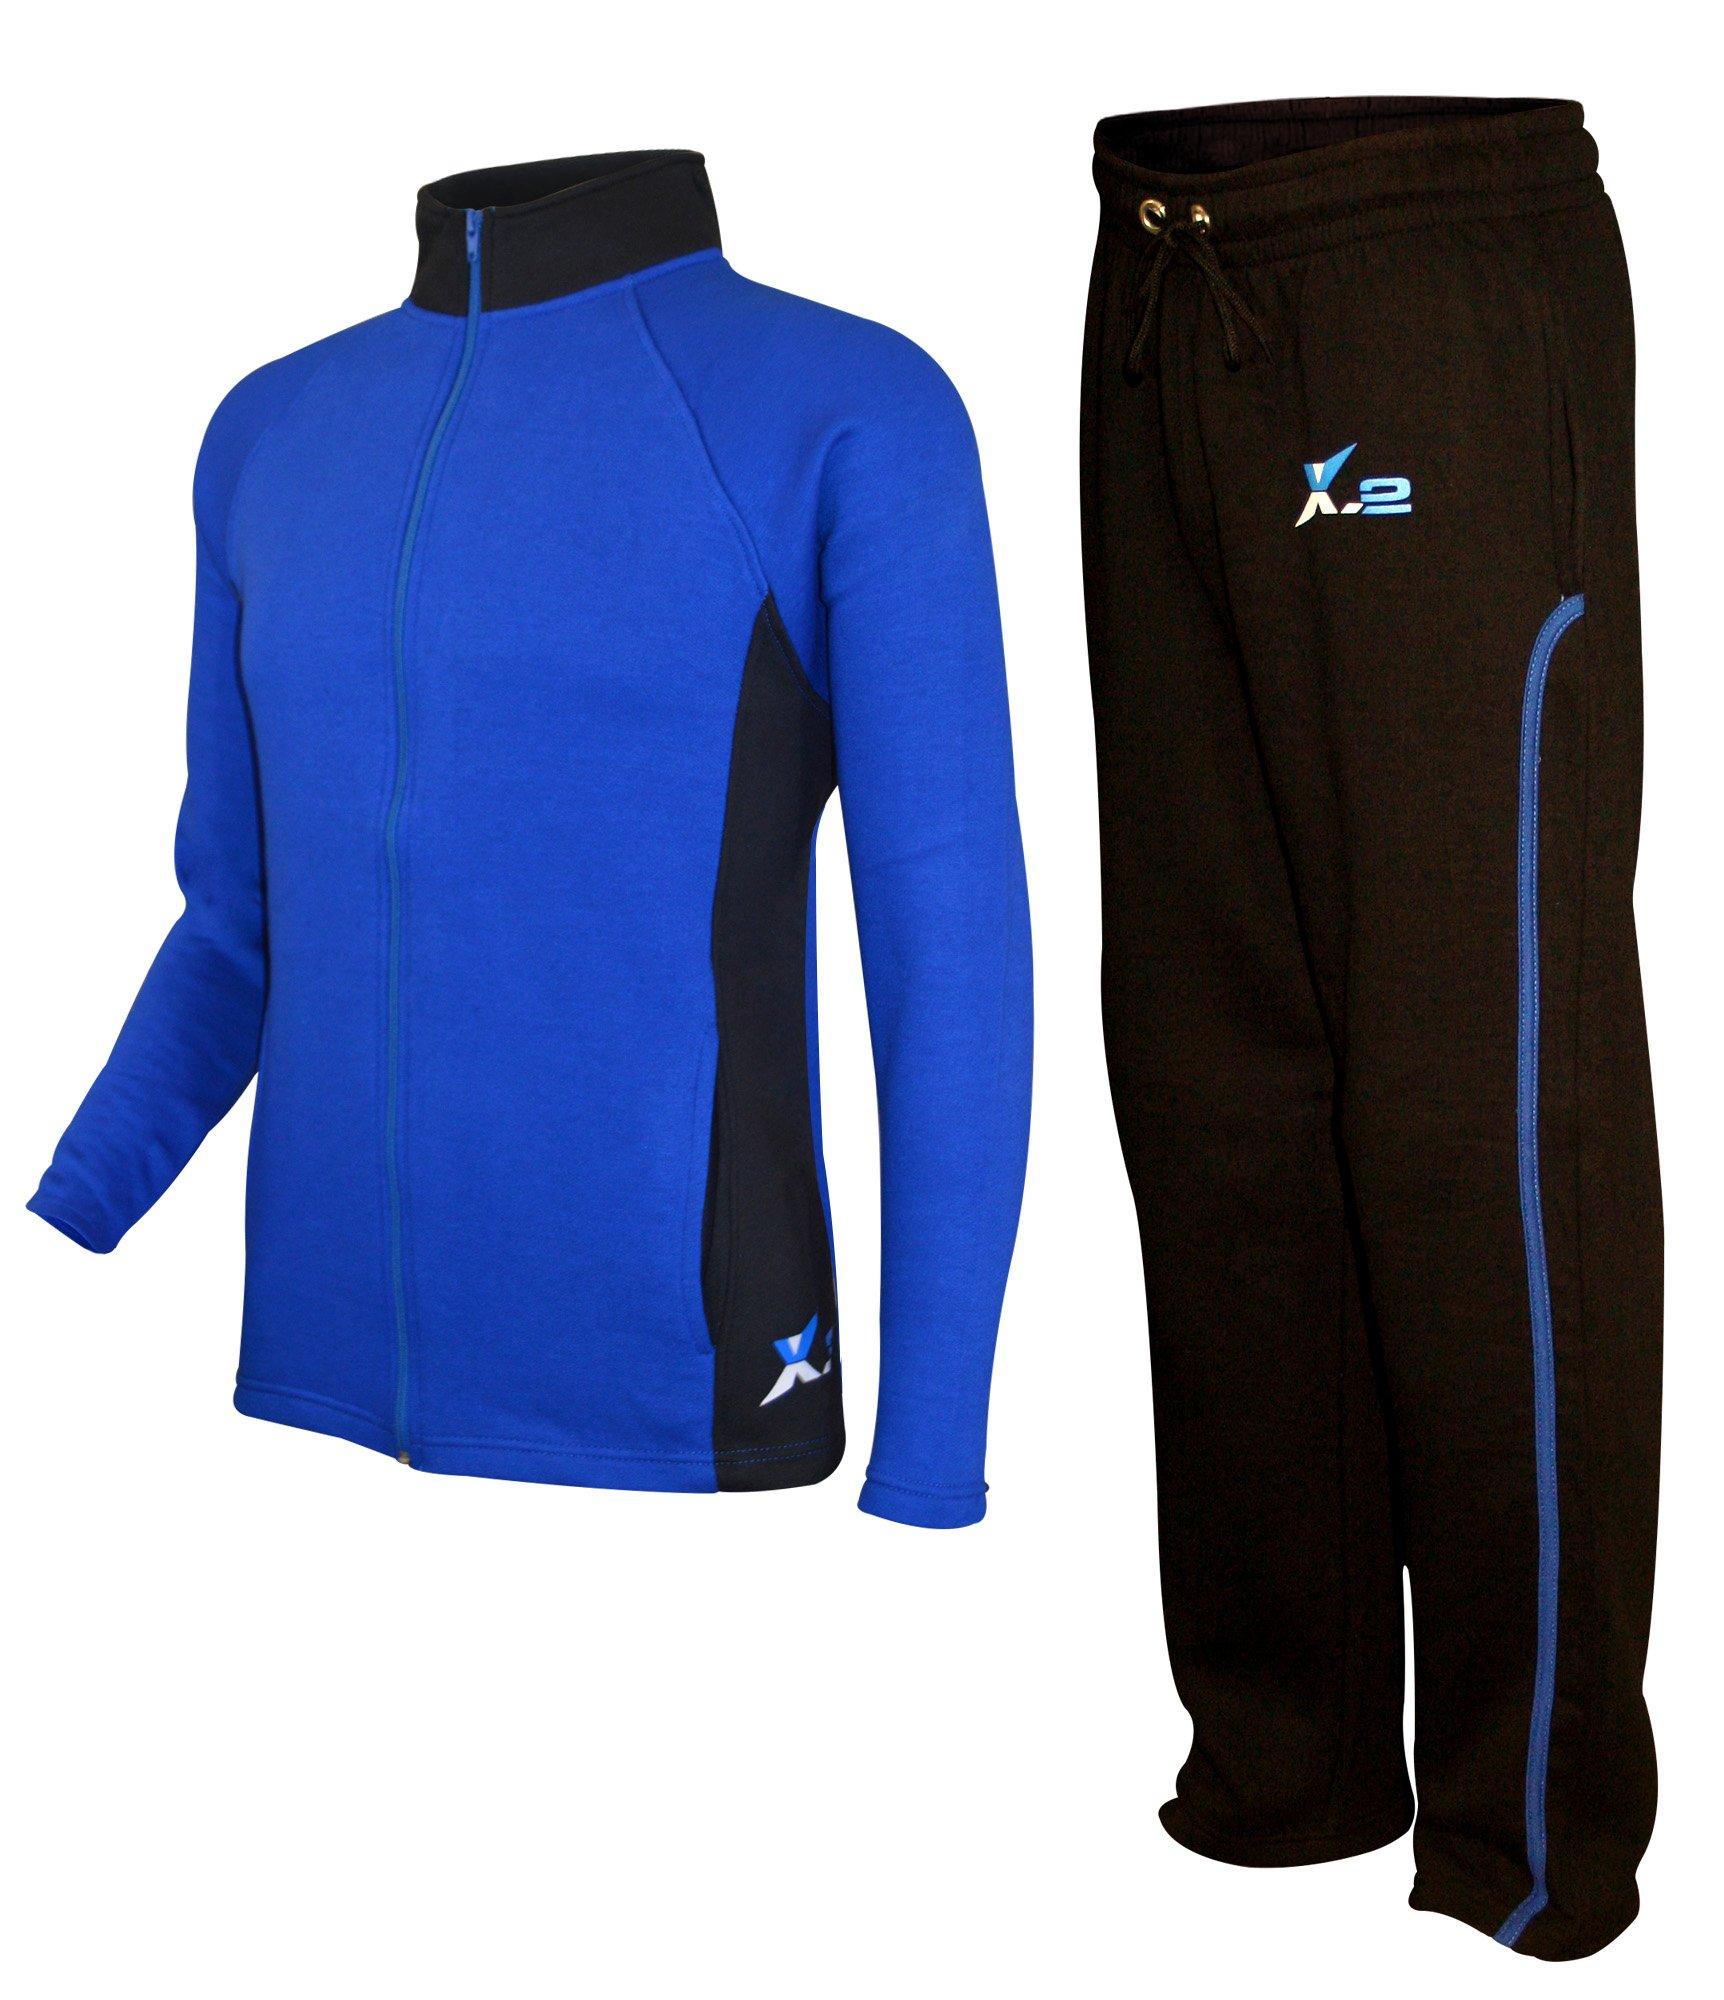 X-2 Mens Athletic Full Zip Fleece Tracksuit Jogging Sweatsuit Activewear Blue-Black XL